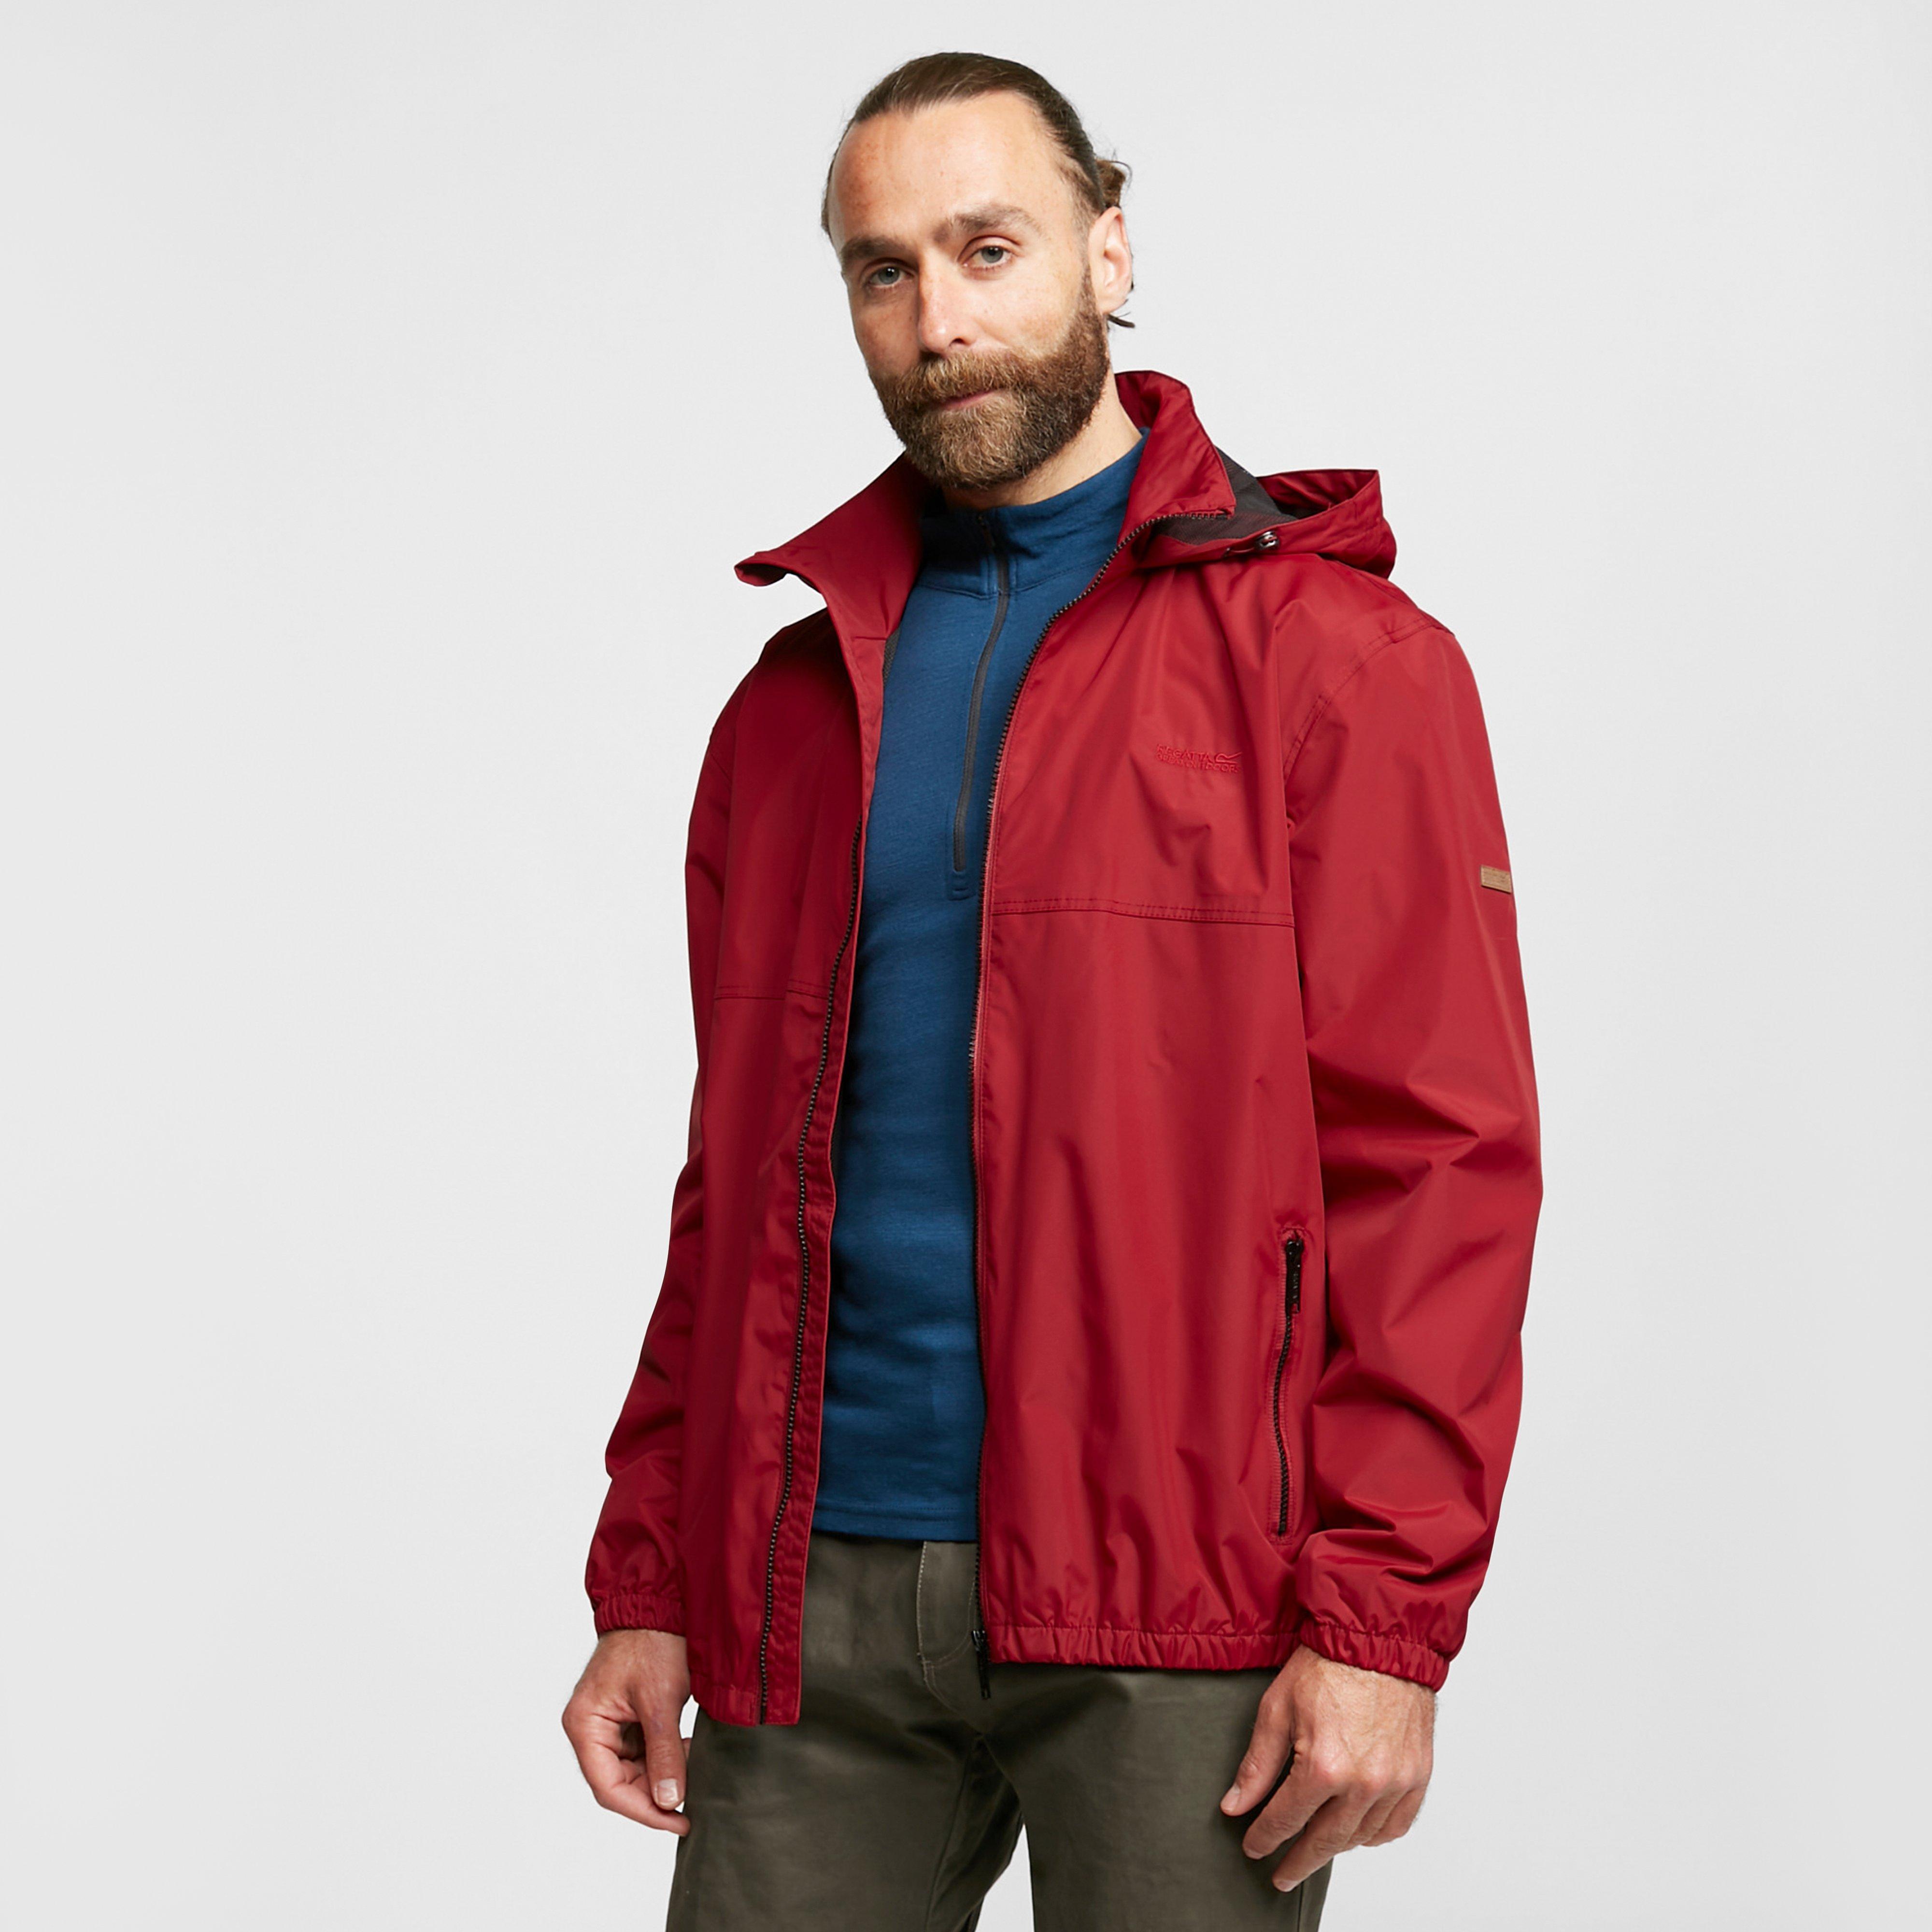 Regatta Men's Ladomir Waterproof Bomber Jacket - Red/Red, Red